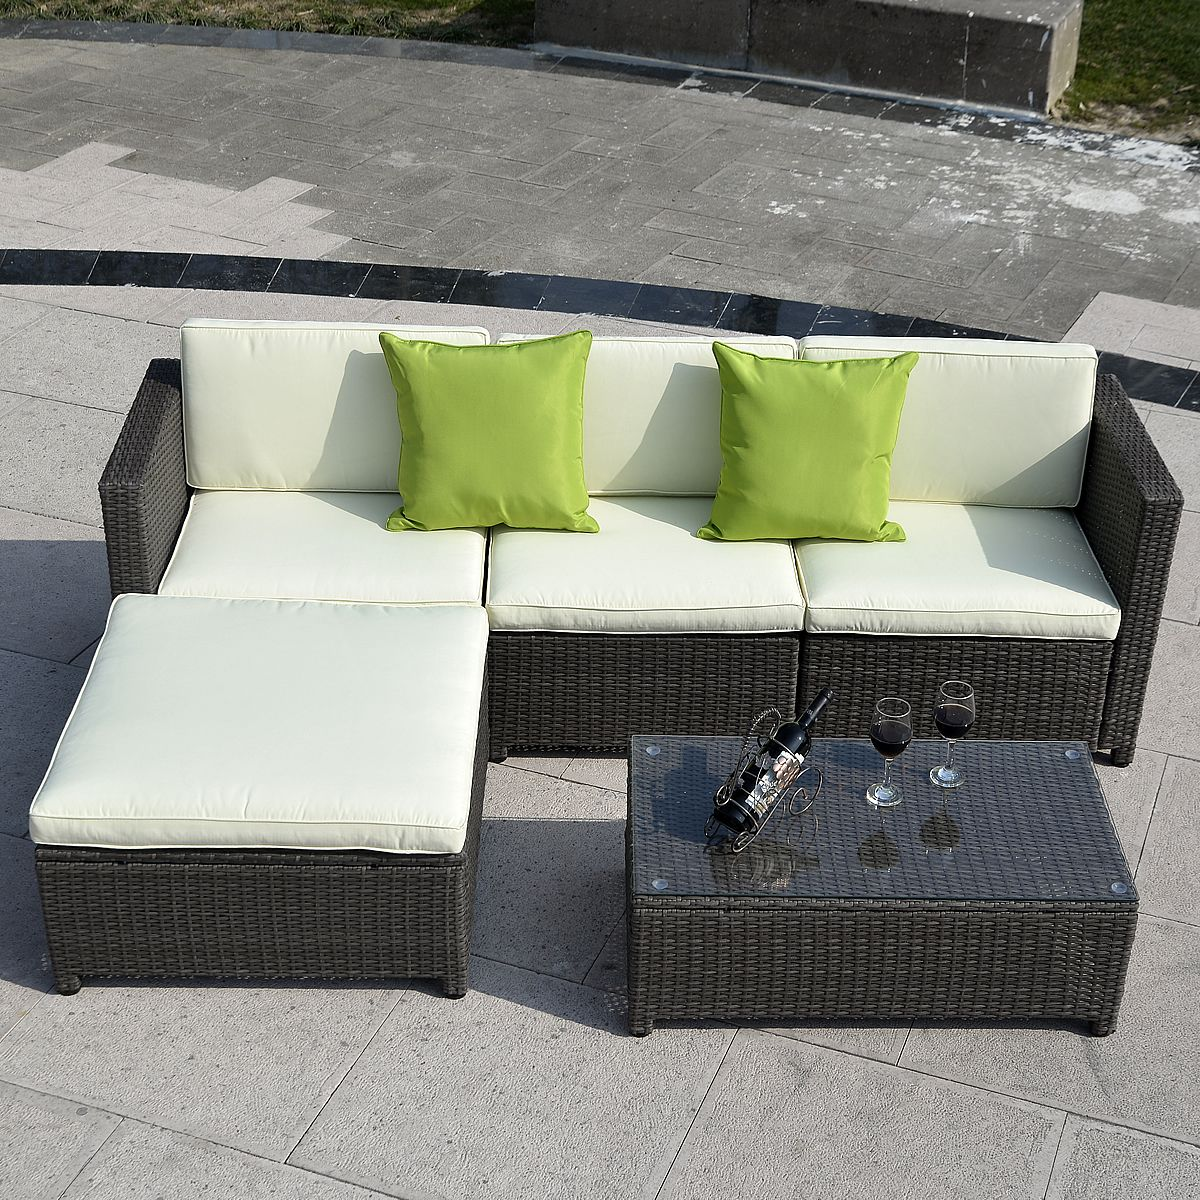 5 Pcs Wicker Rattan Sofa Cushioned Set Sectional Patio Furniture